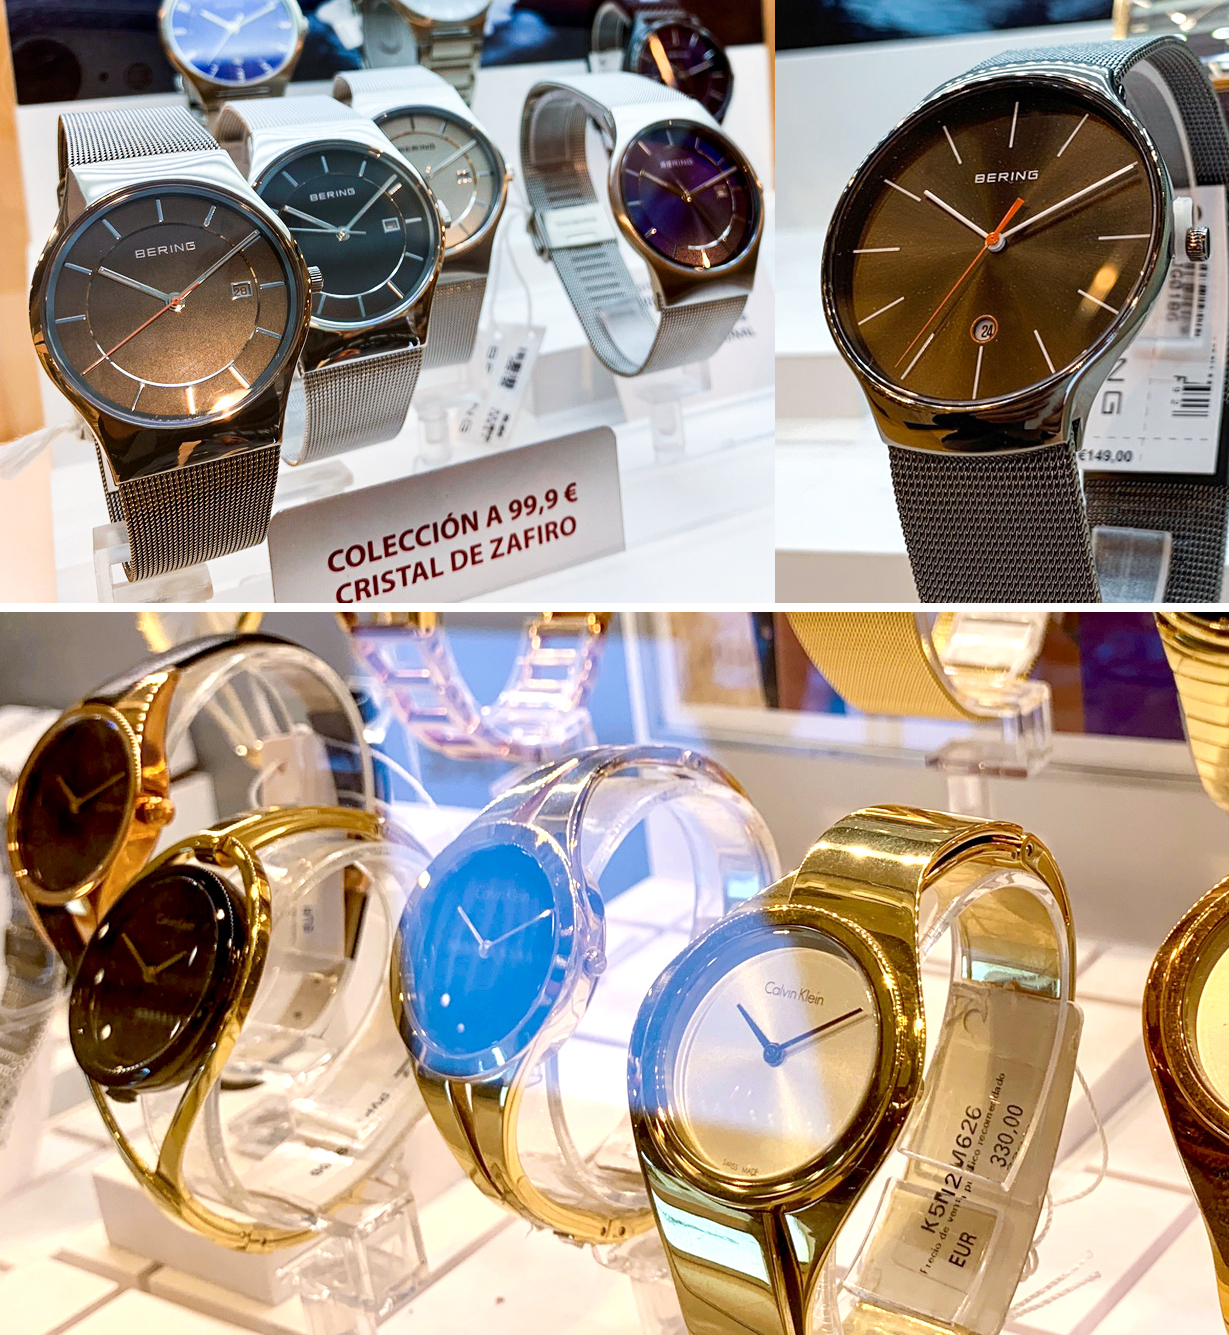 relojes estilo clásico dorados plateados Bering Calvin Klein